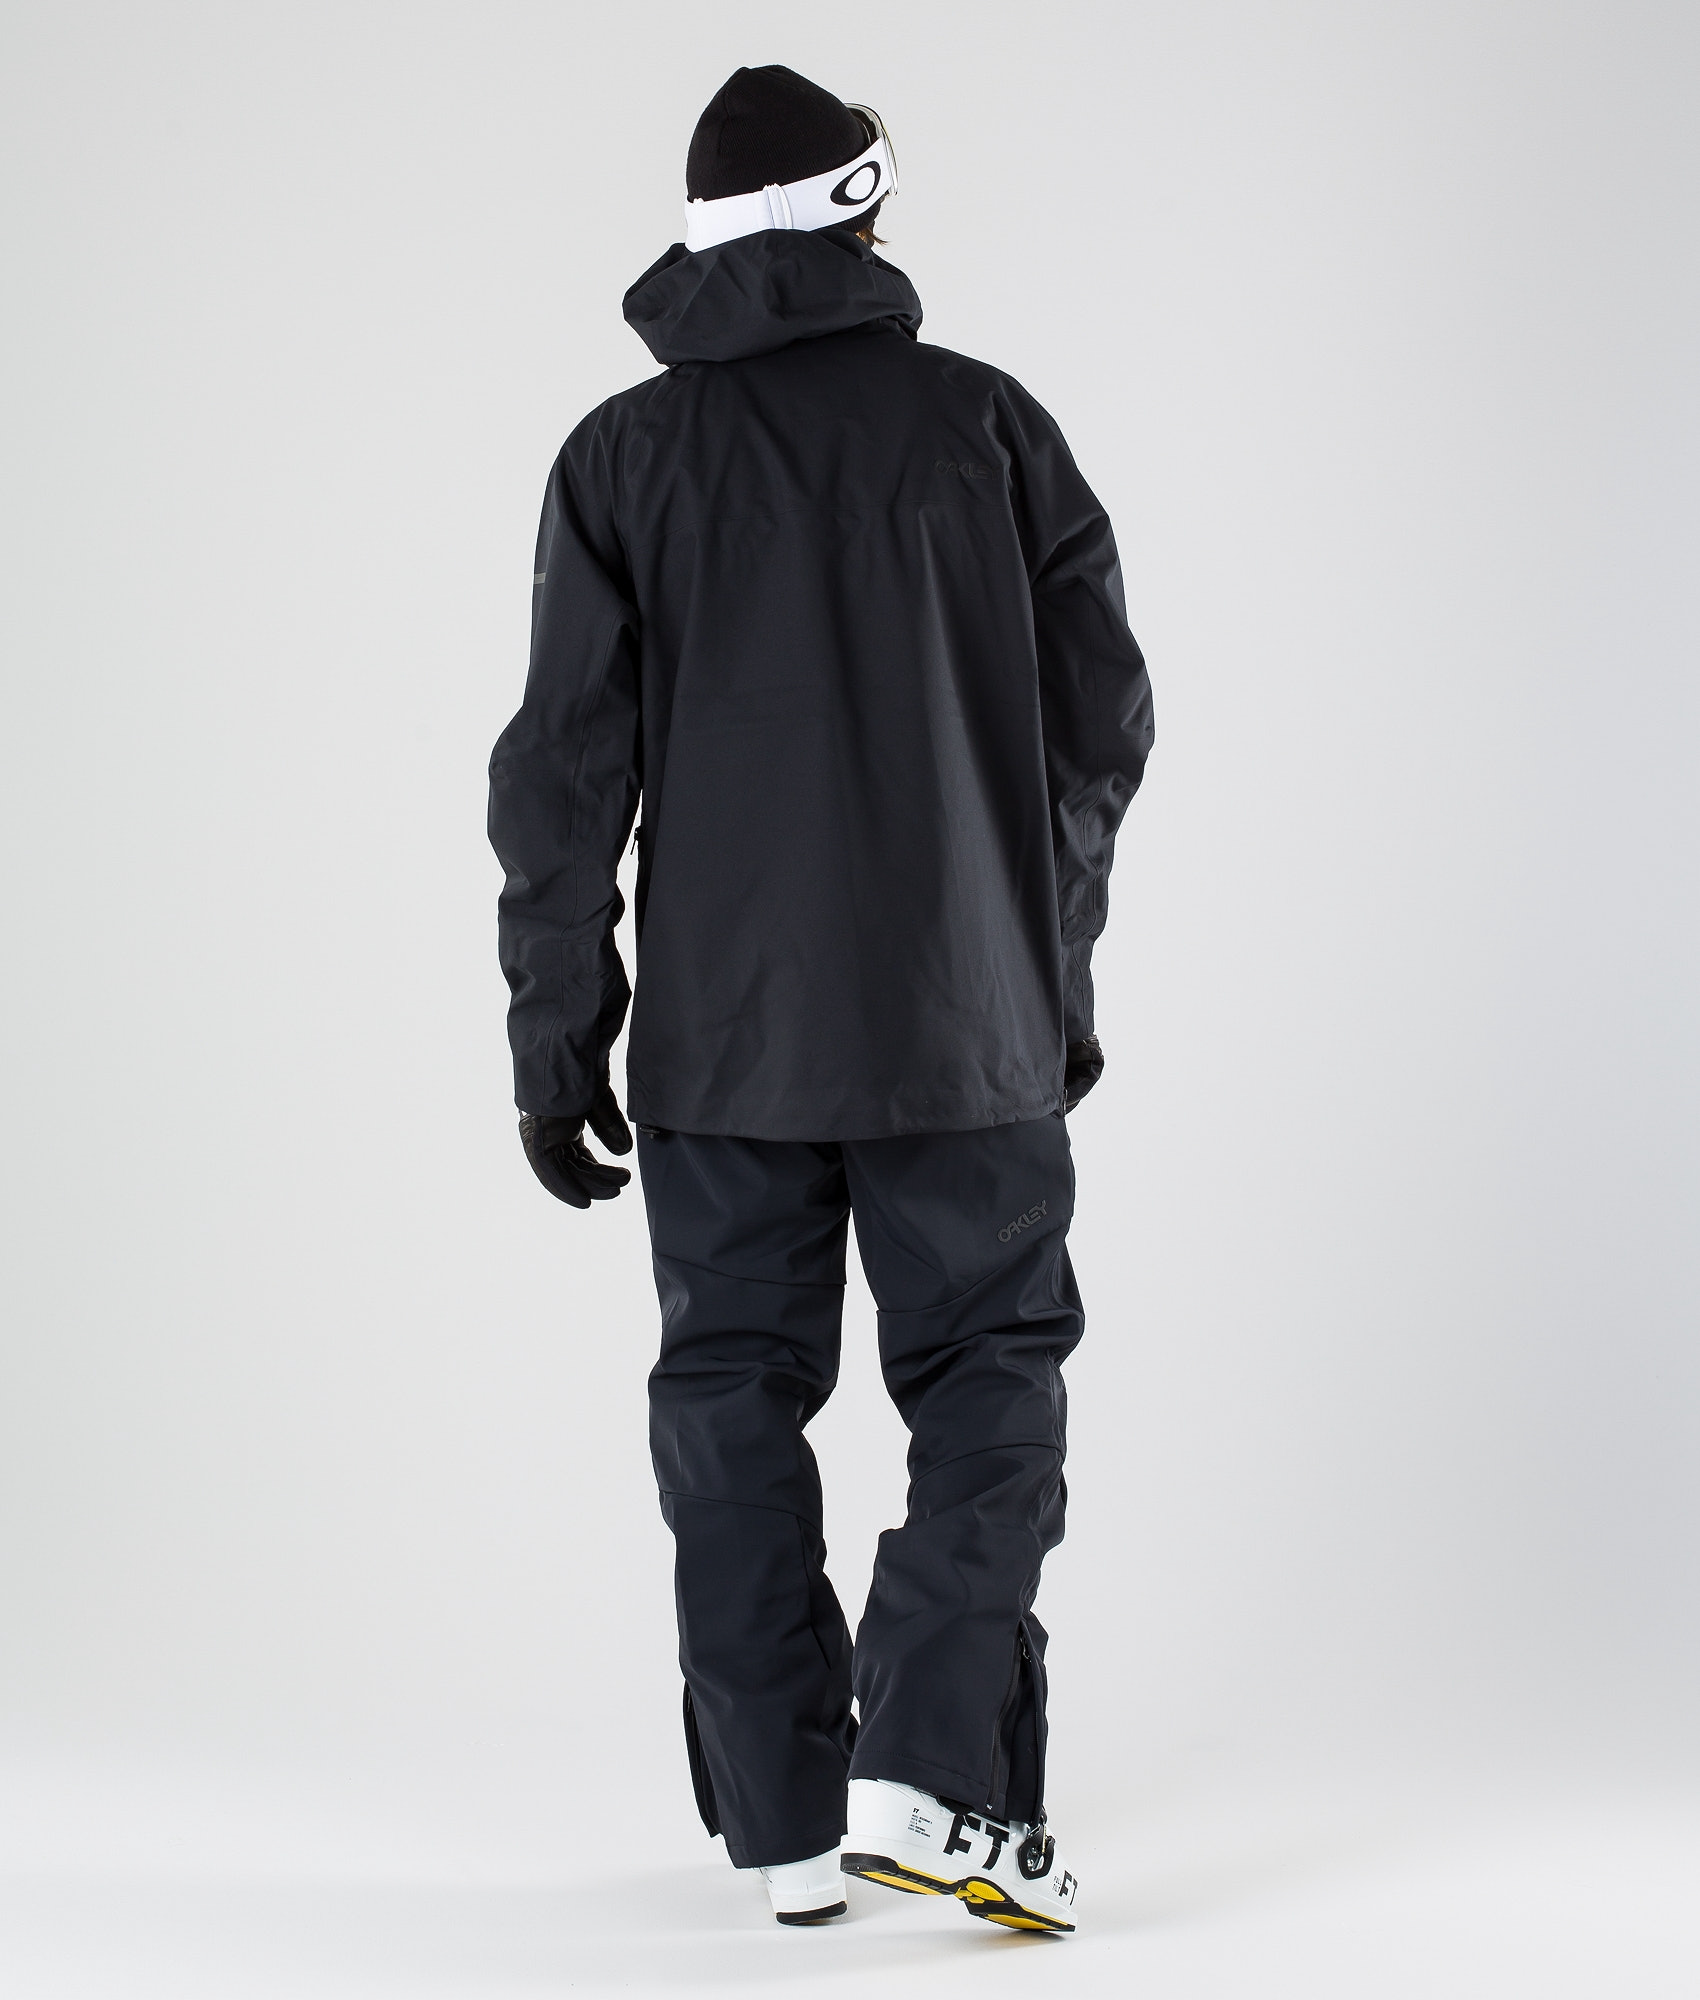 8a5b7a45ab5 Oakley Snow Shell 10K  2L Anorak Ski Jacket Blackout - Ridestore.com